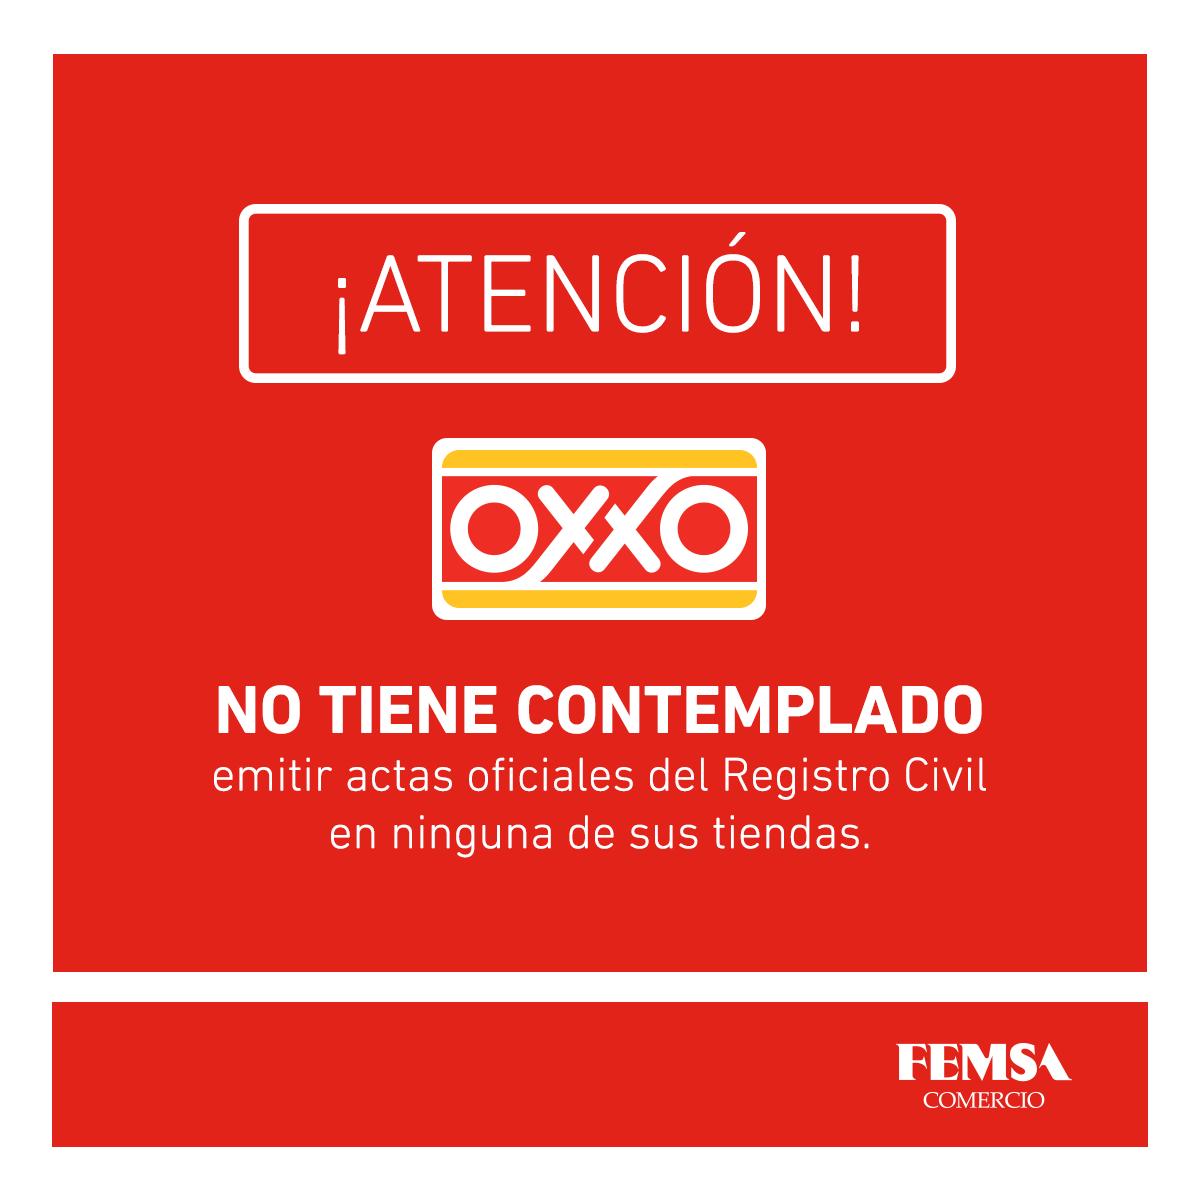 Información relevante para la comunidad de @Tiendas_OXXO https://t.co/D3O6Ar33E0 https://t.co/UOafHEHBQw